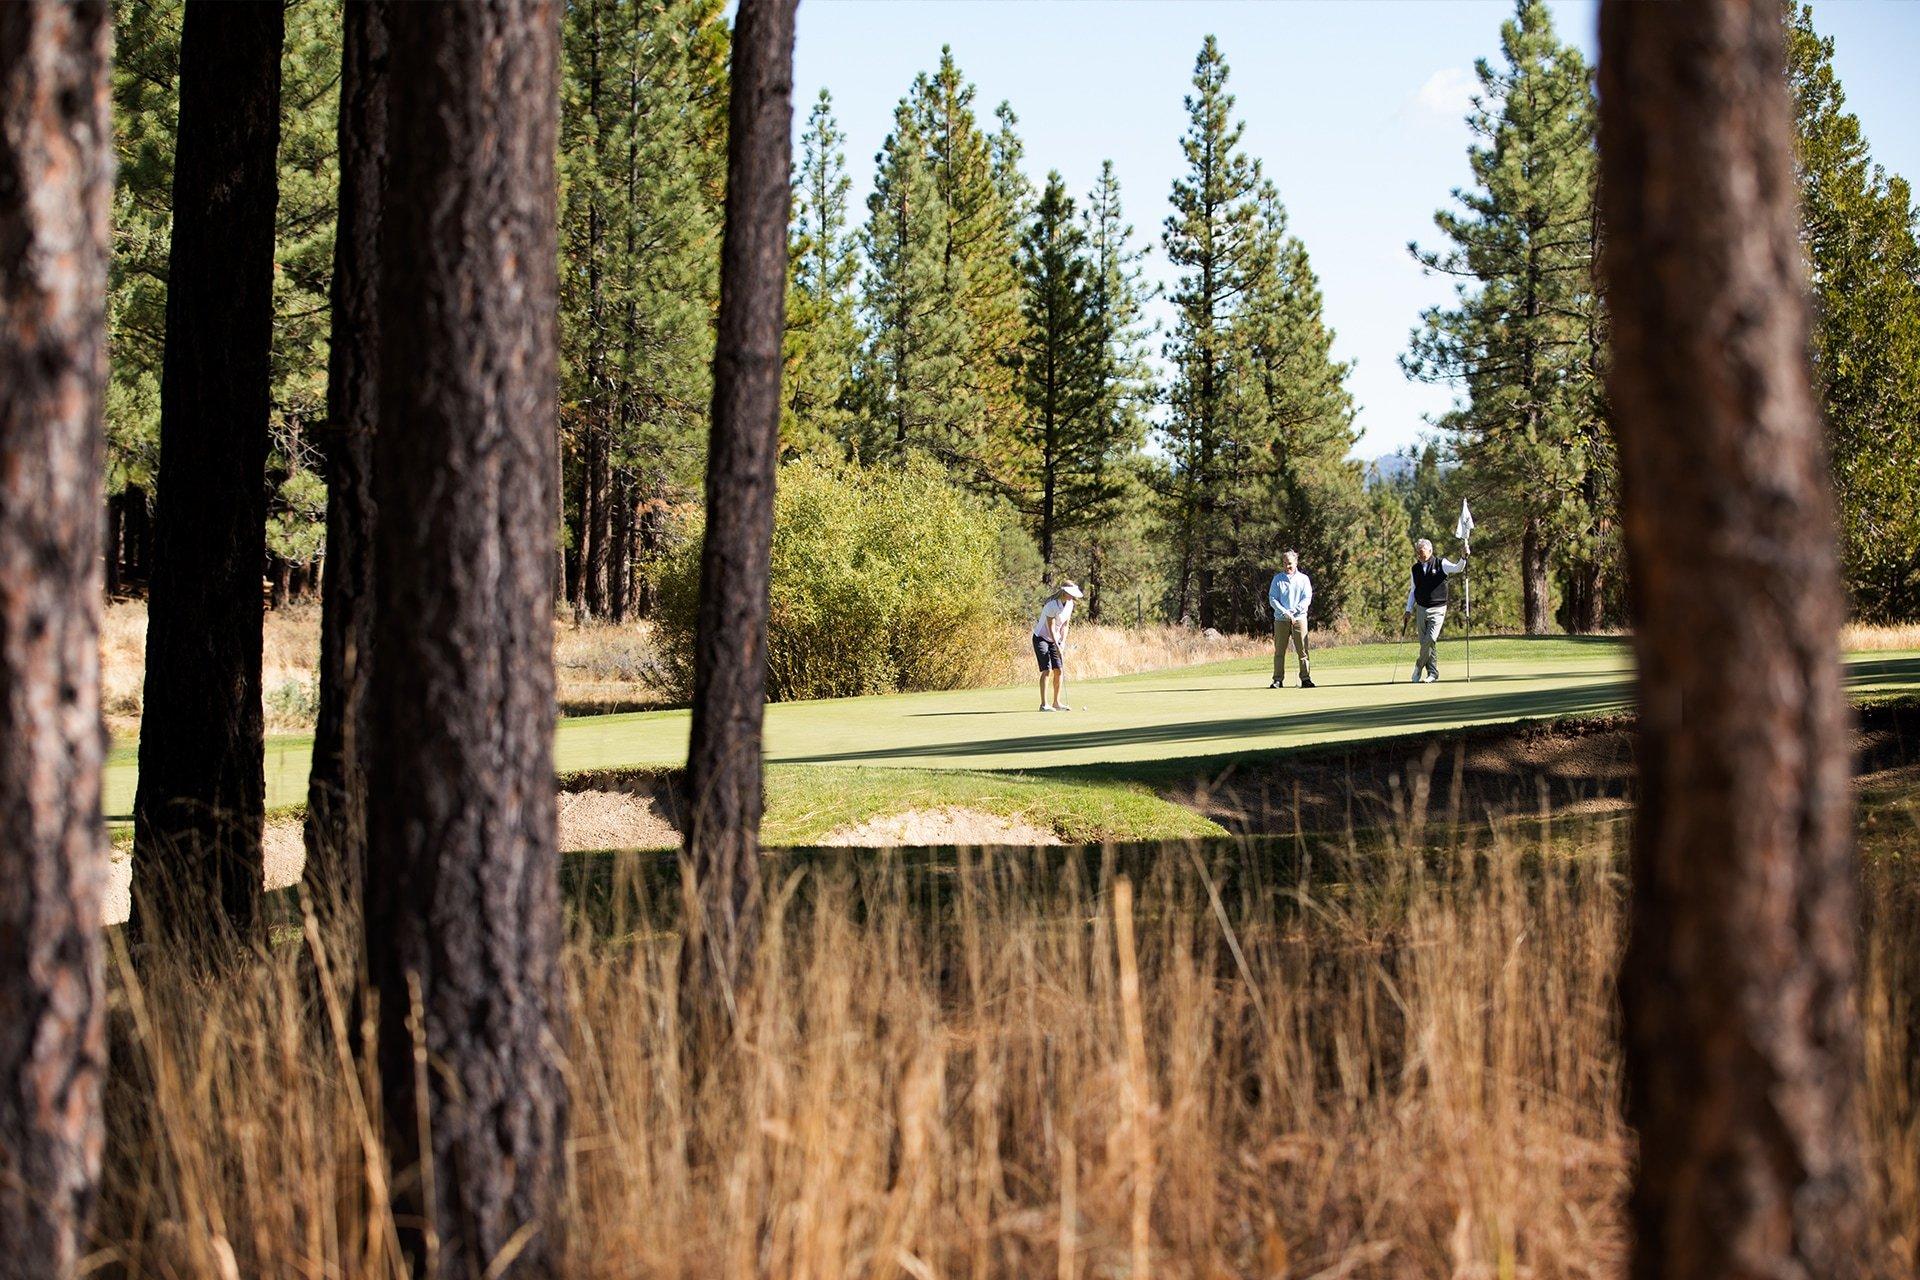 Golfers putting The Dragon Golf